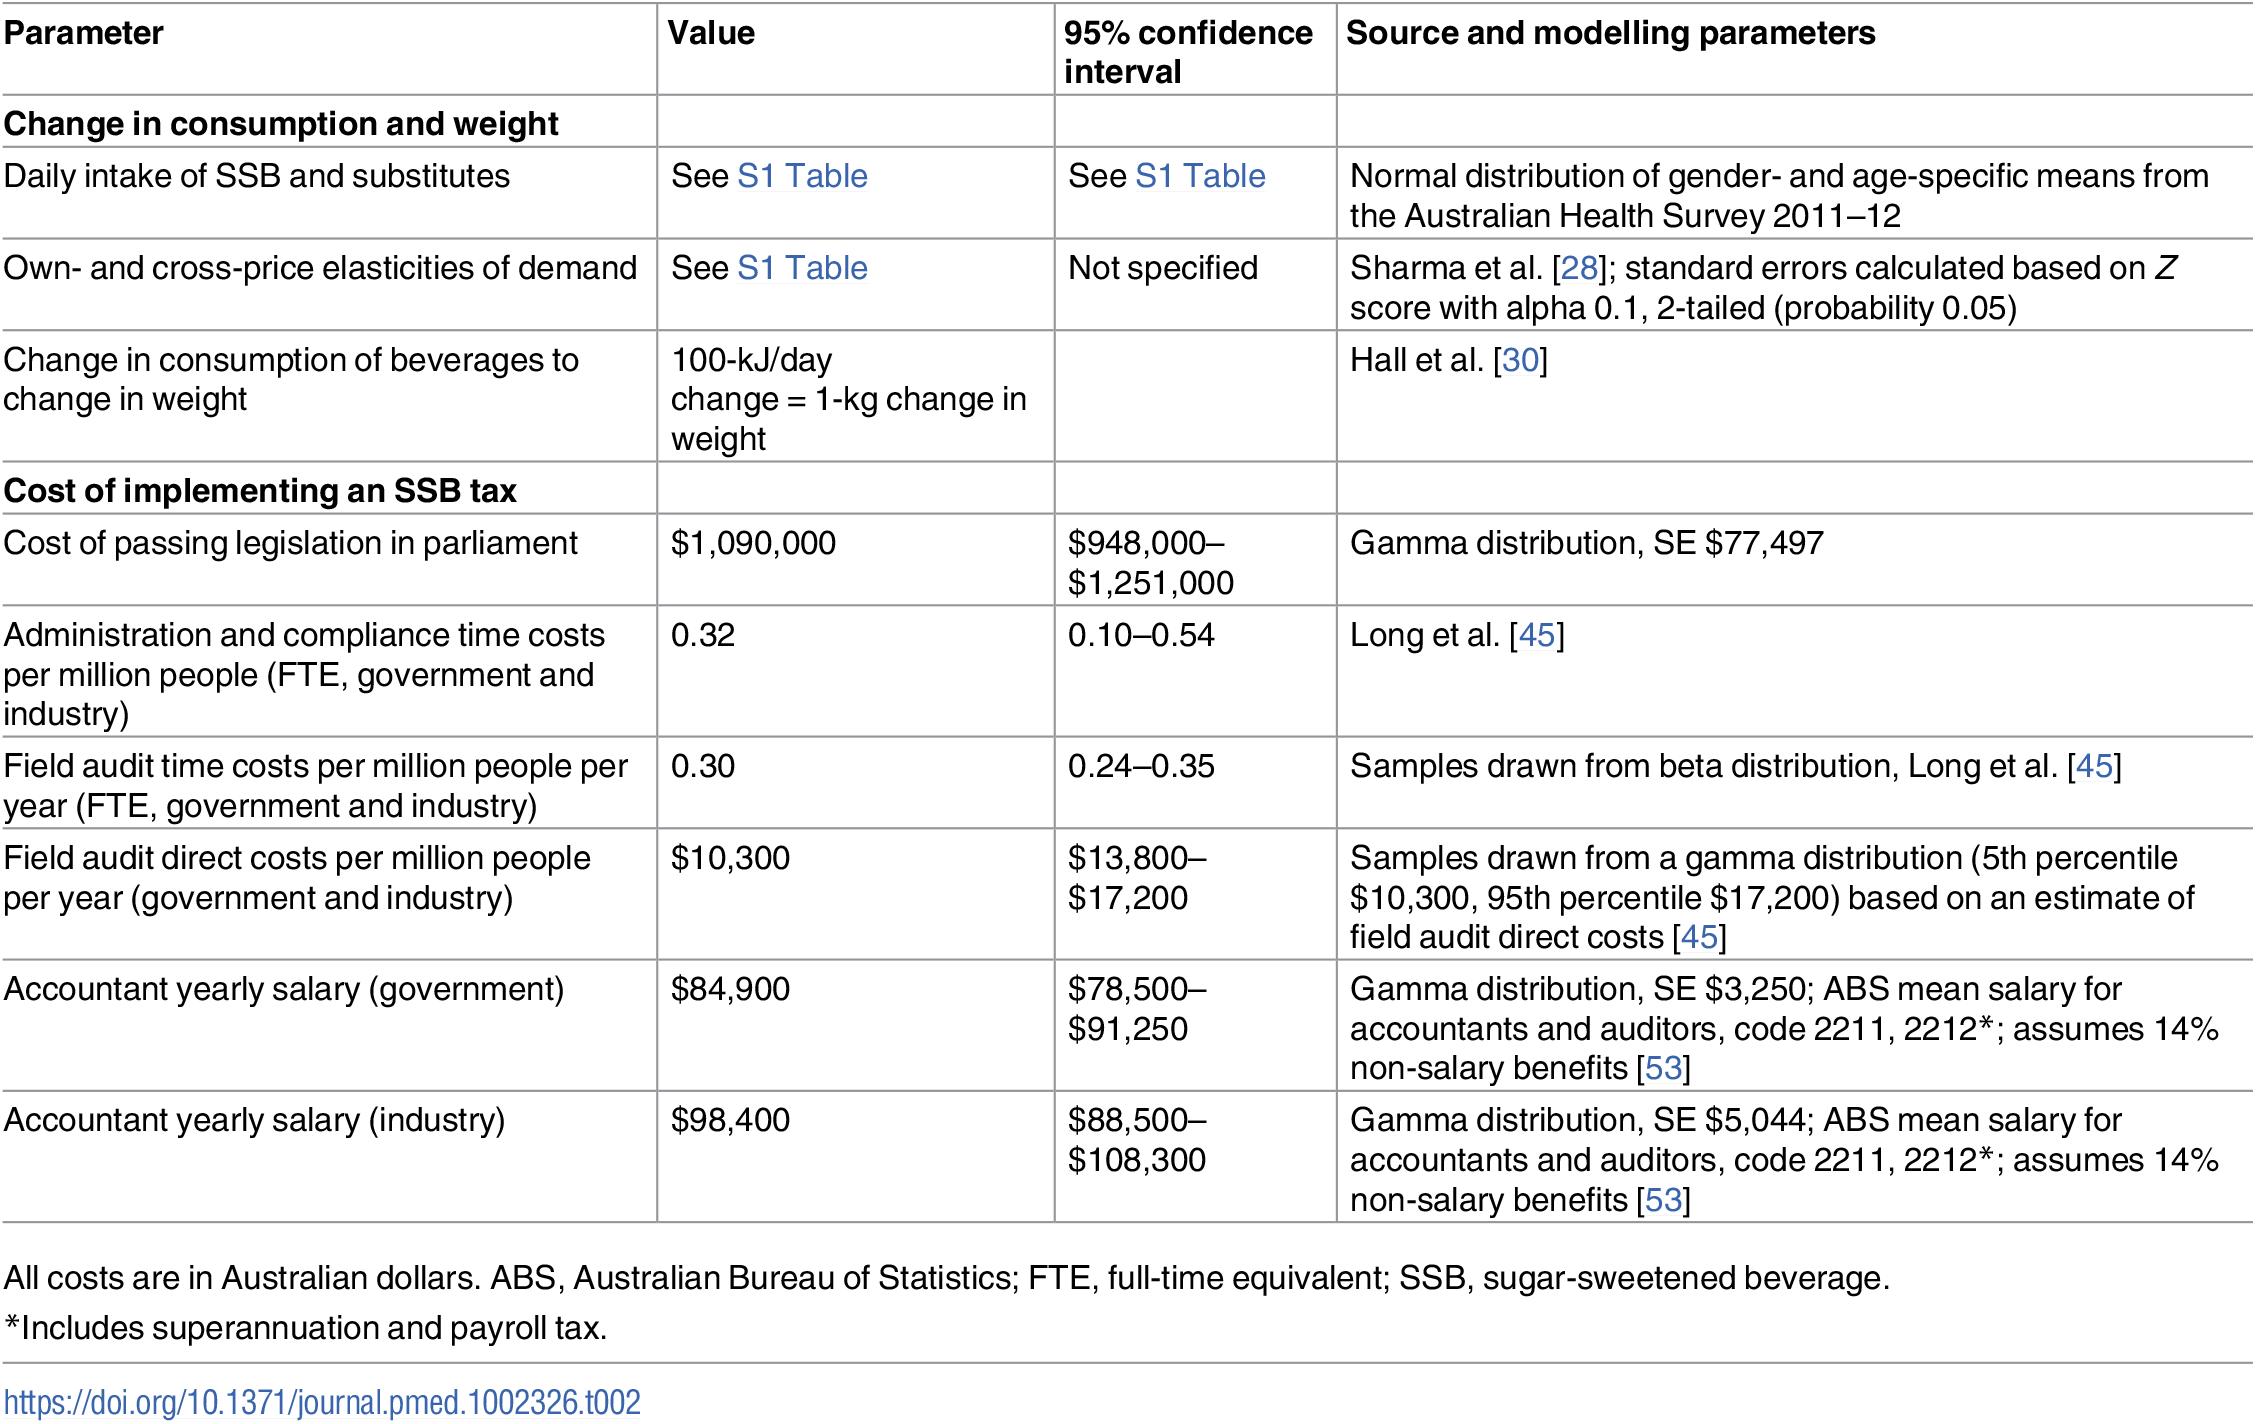 Key model parameters.